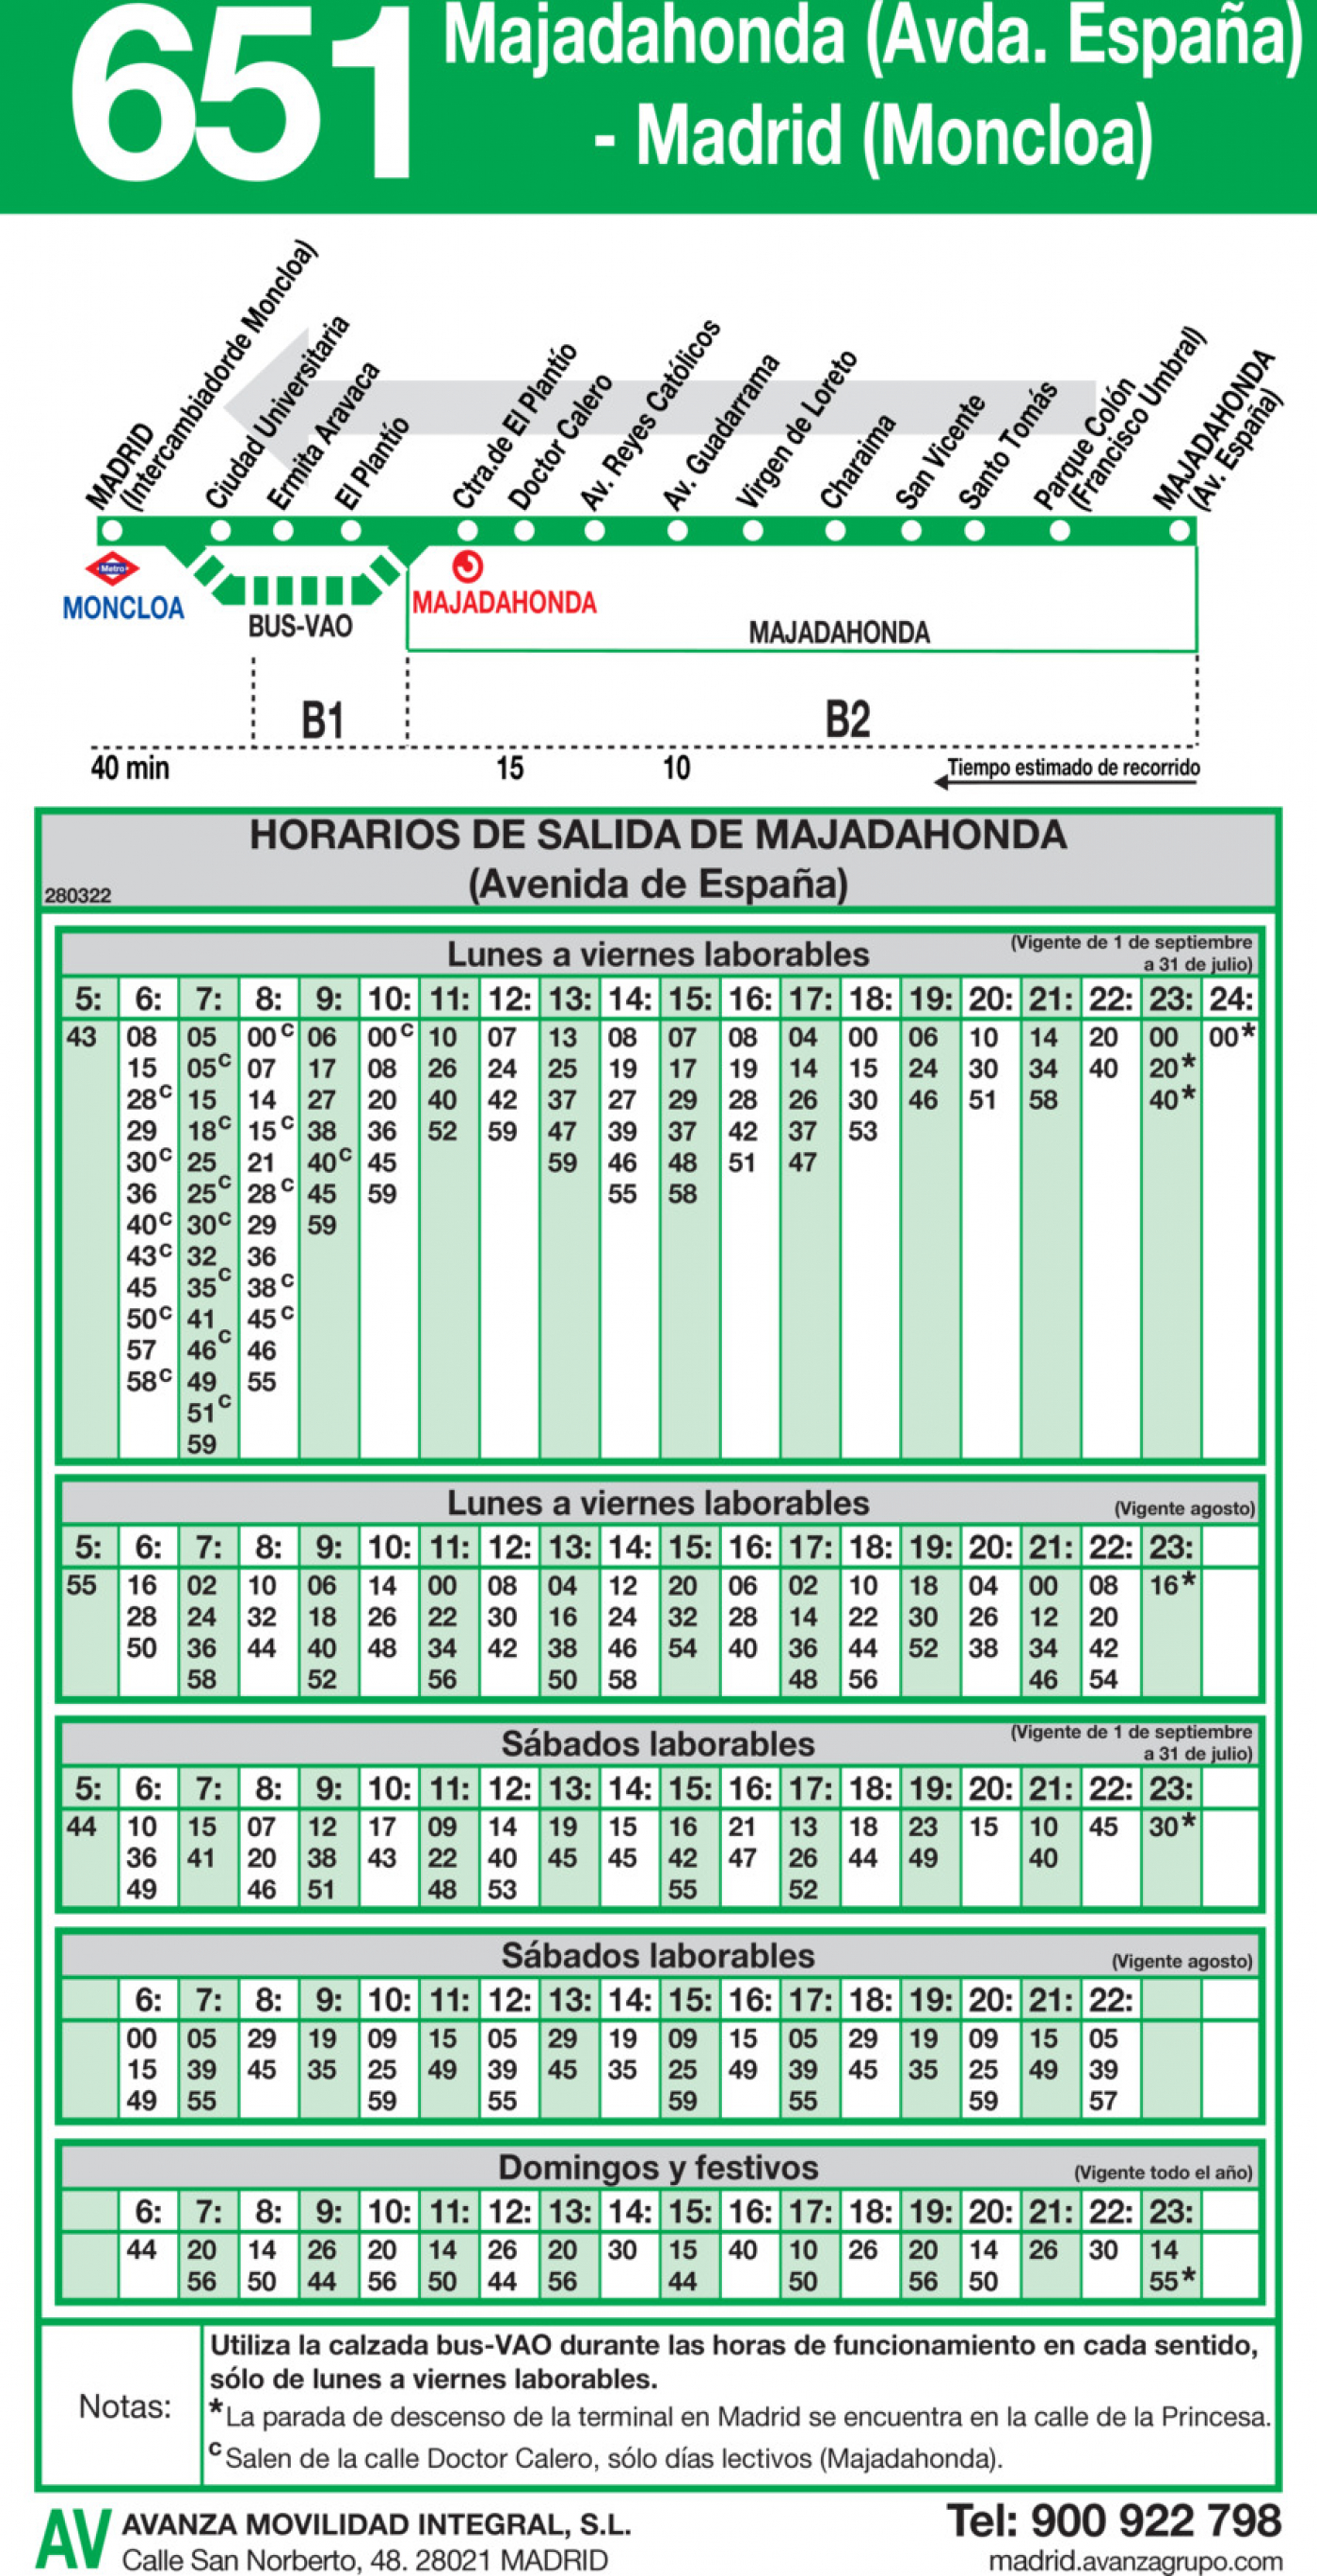 Tabla de horarios y frecuencias de paso en sentido vuelta Línea 651: Madrid (Moncloa) - Majadahonda (Avenida de España)